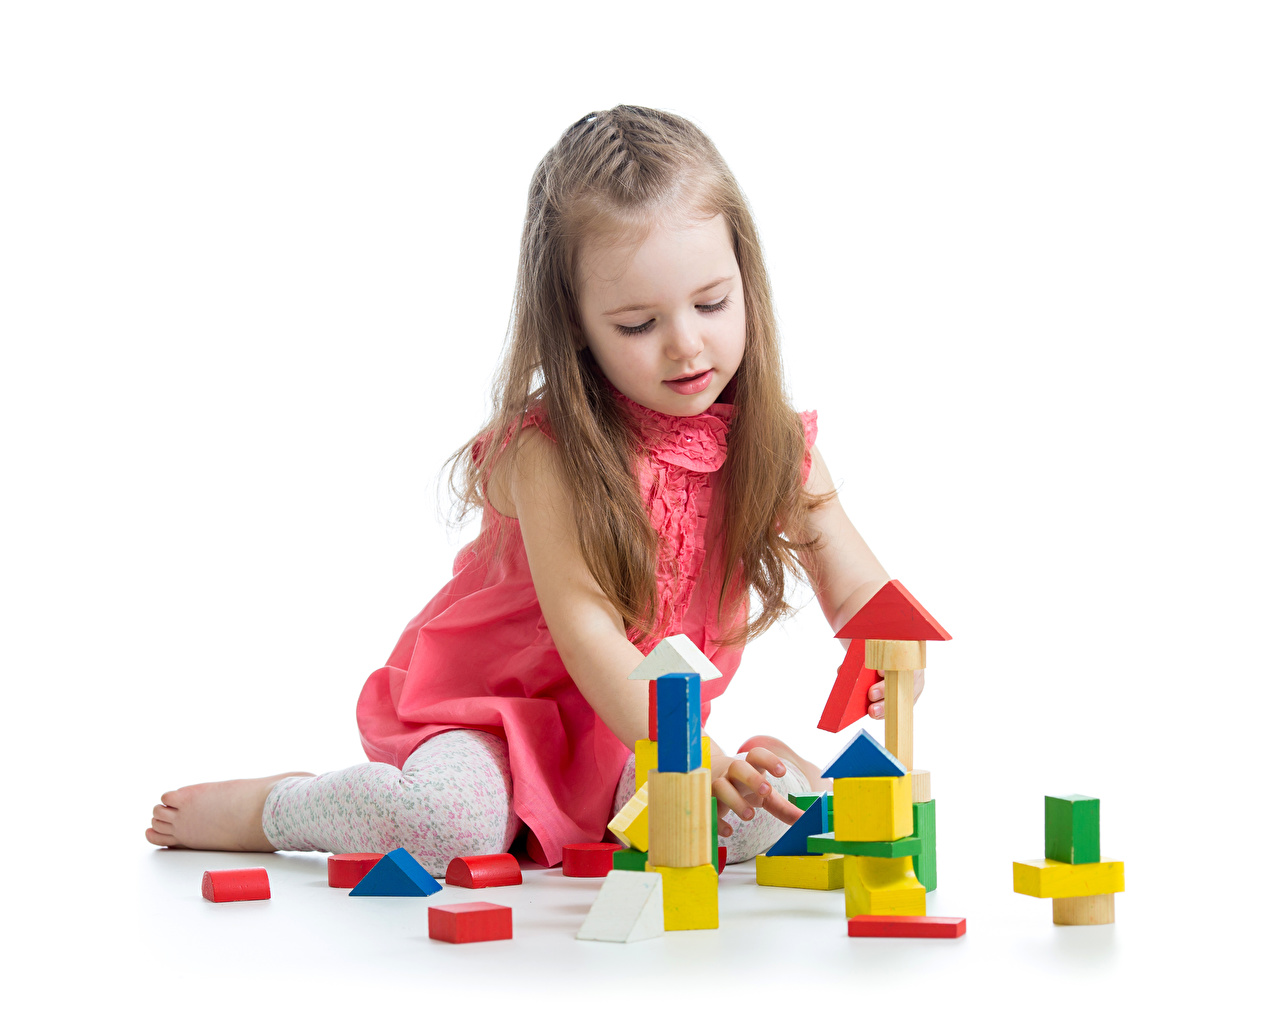 Картинки ребёнок Девочки играют Игрушки Белый фон Дети девочка Играет игрушка белом фоне белым фоном